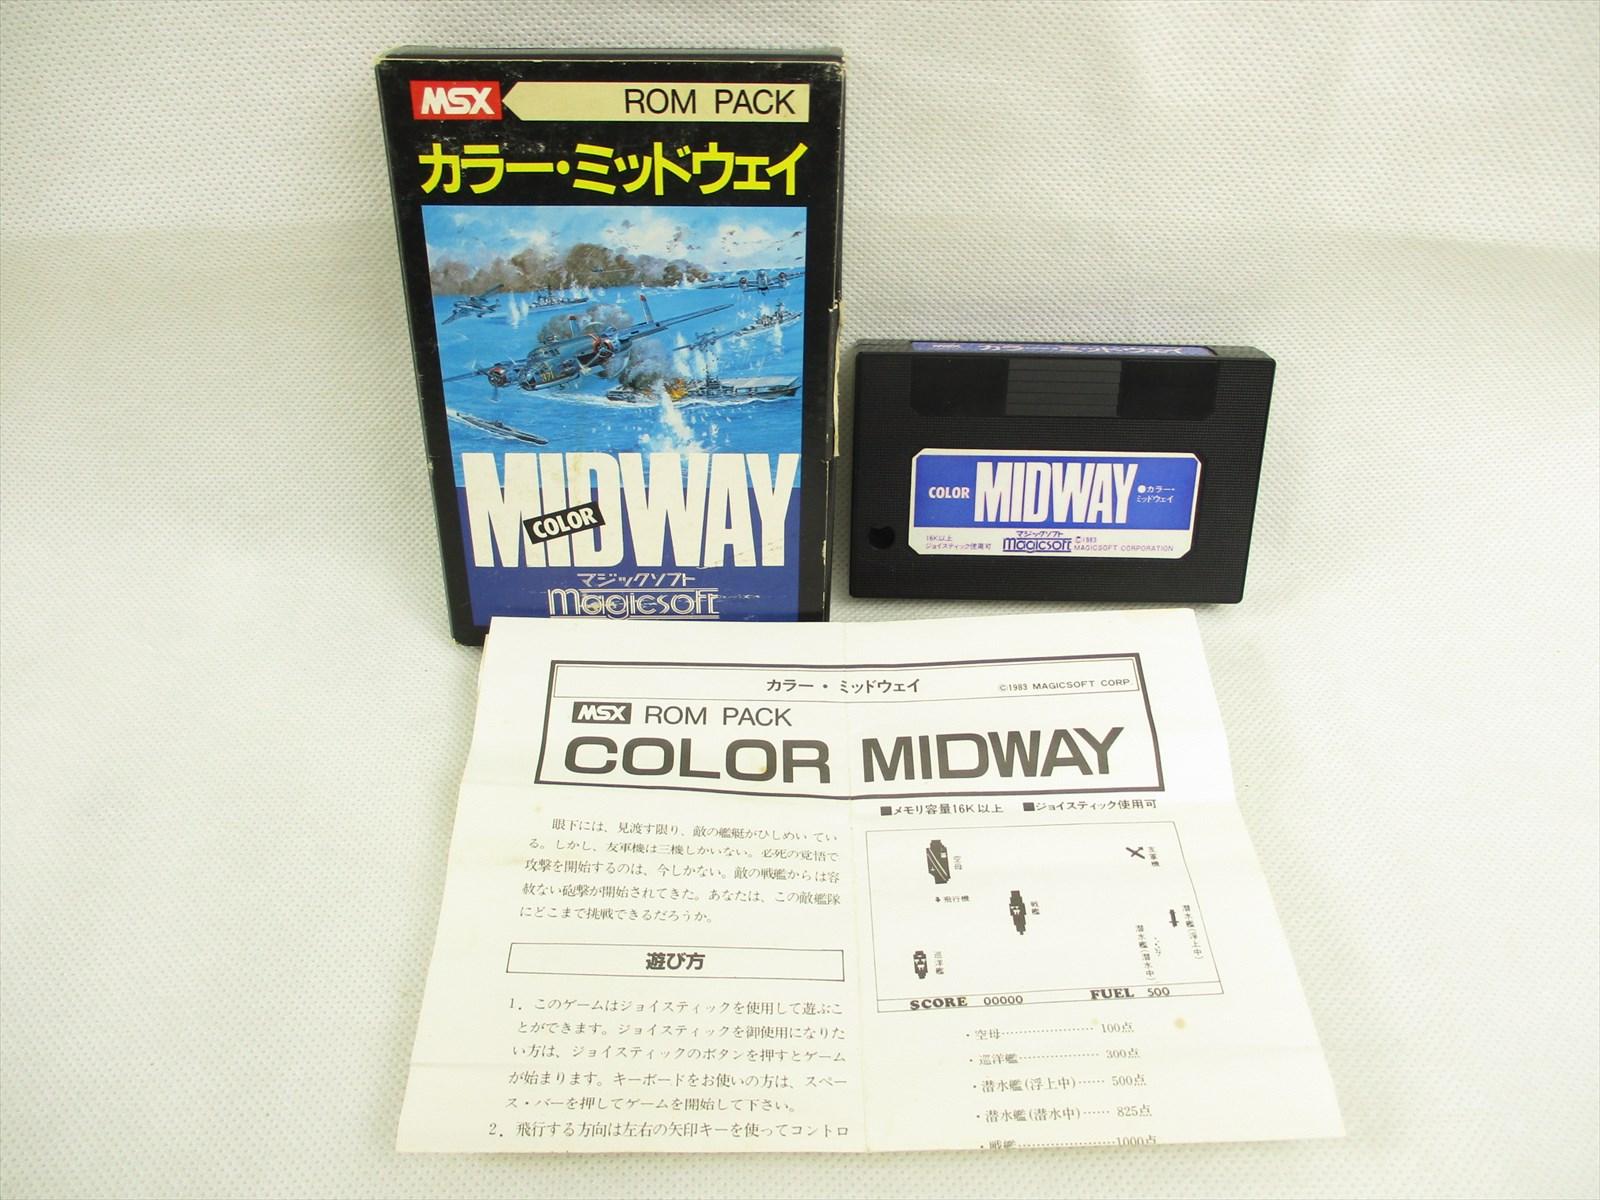 MSX XEVIOUS Item Ref//1541 MSX2 Import Japan Video Game msx